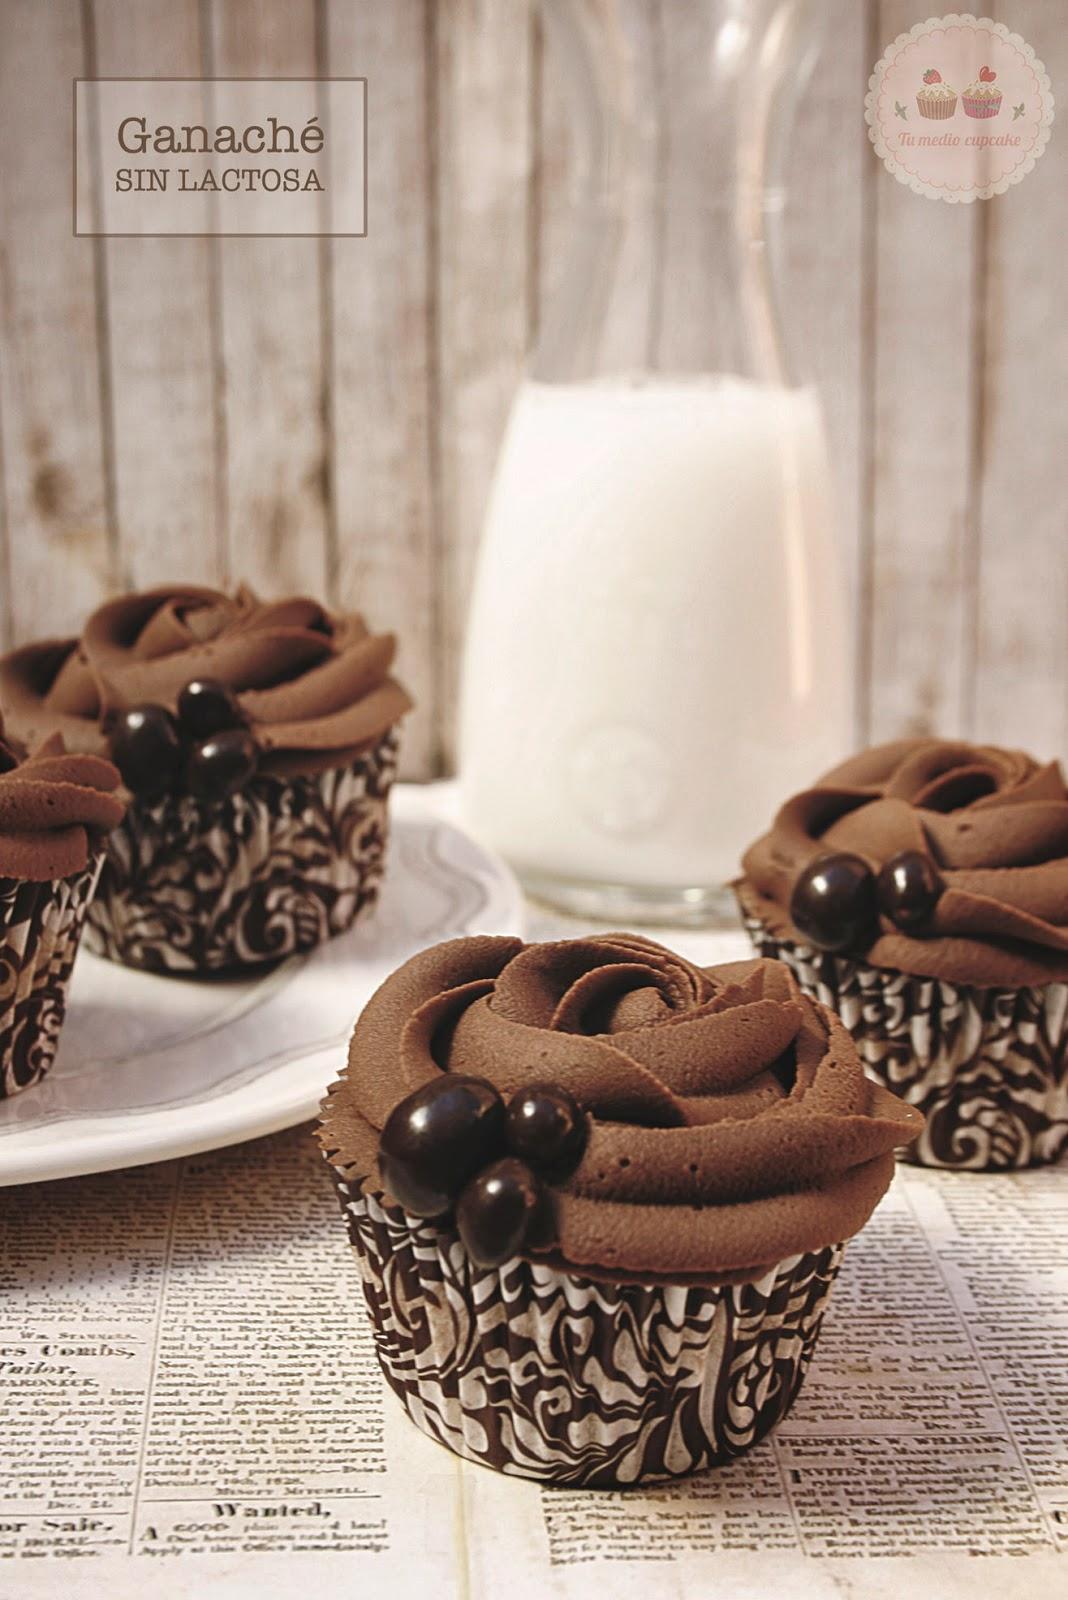 ganache de chocolate sin lactosa